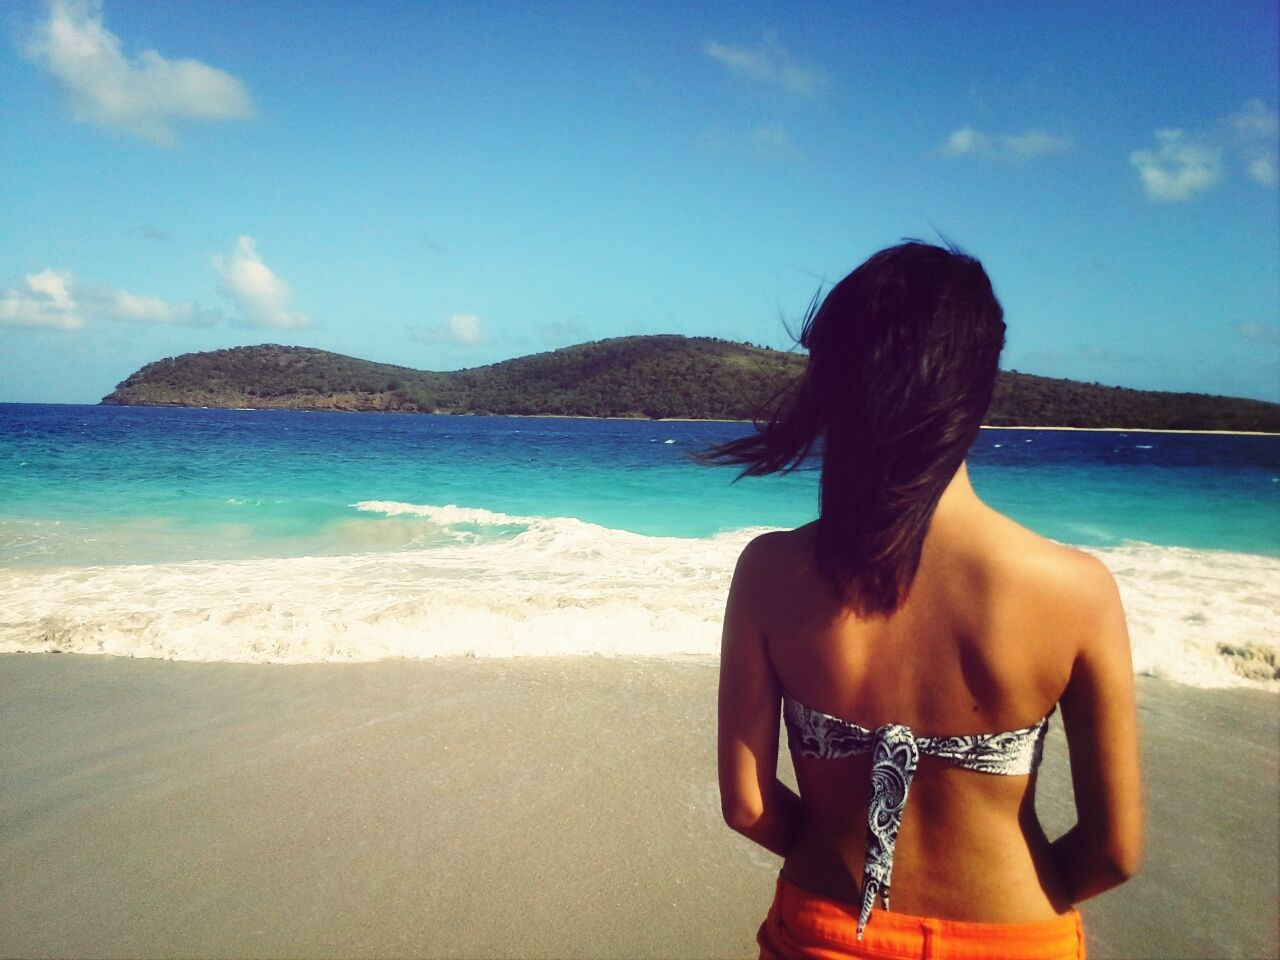 Finding my destiny That's Me Beach Enjoying The Sun Relaxing